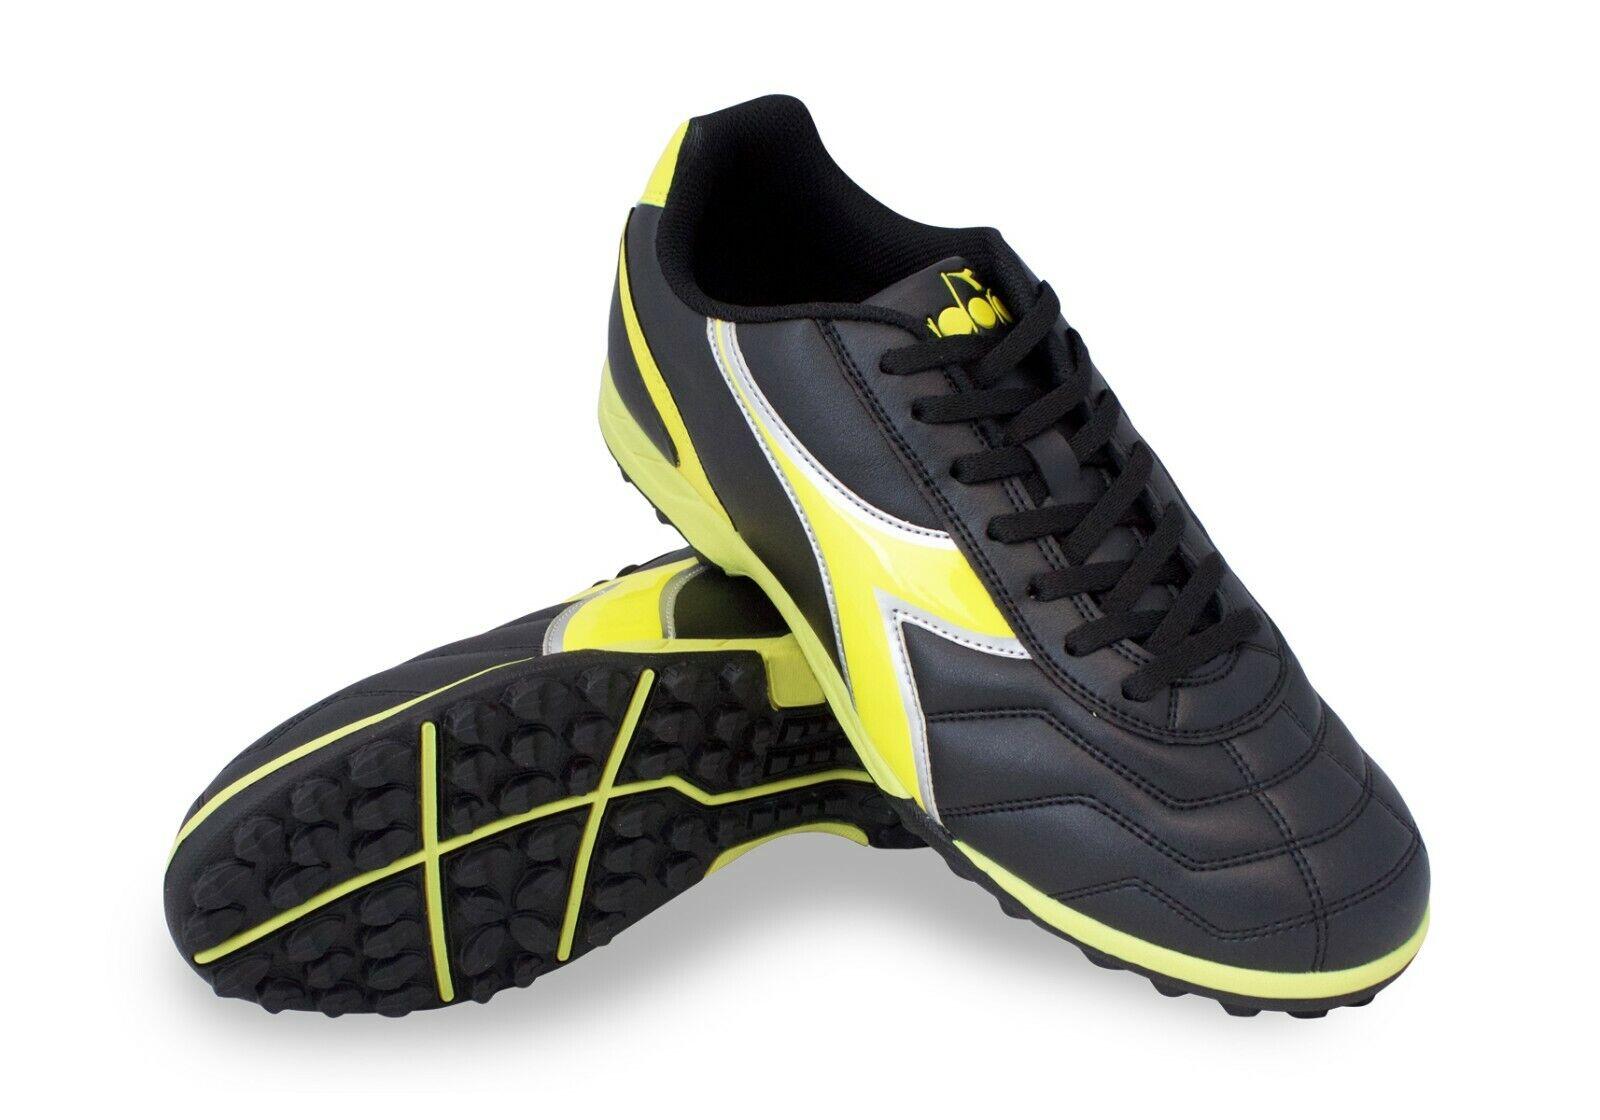 Diadora Men's Capitano TF Turf Soccer Shoes